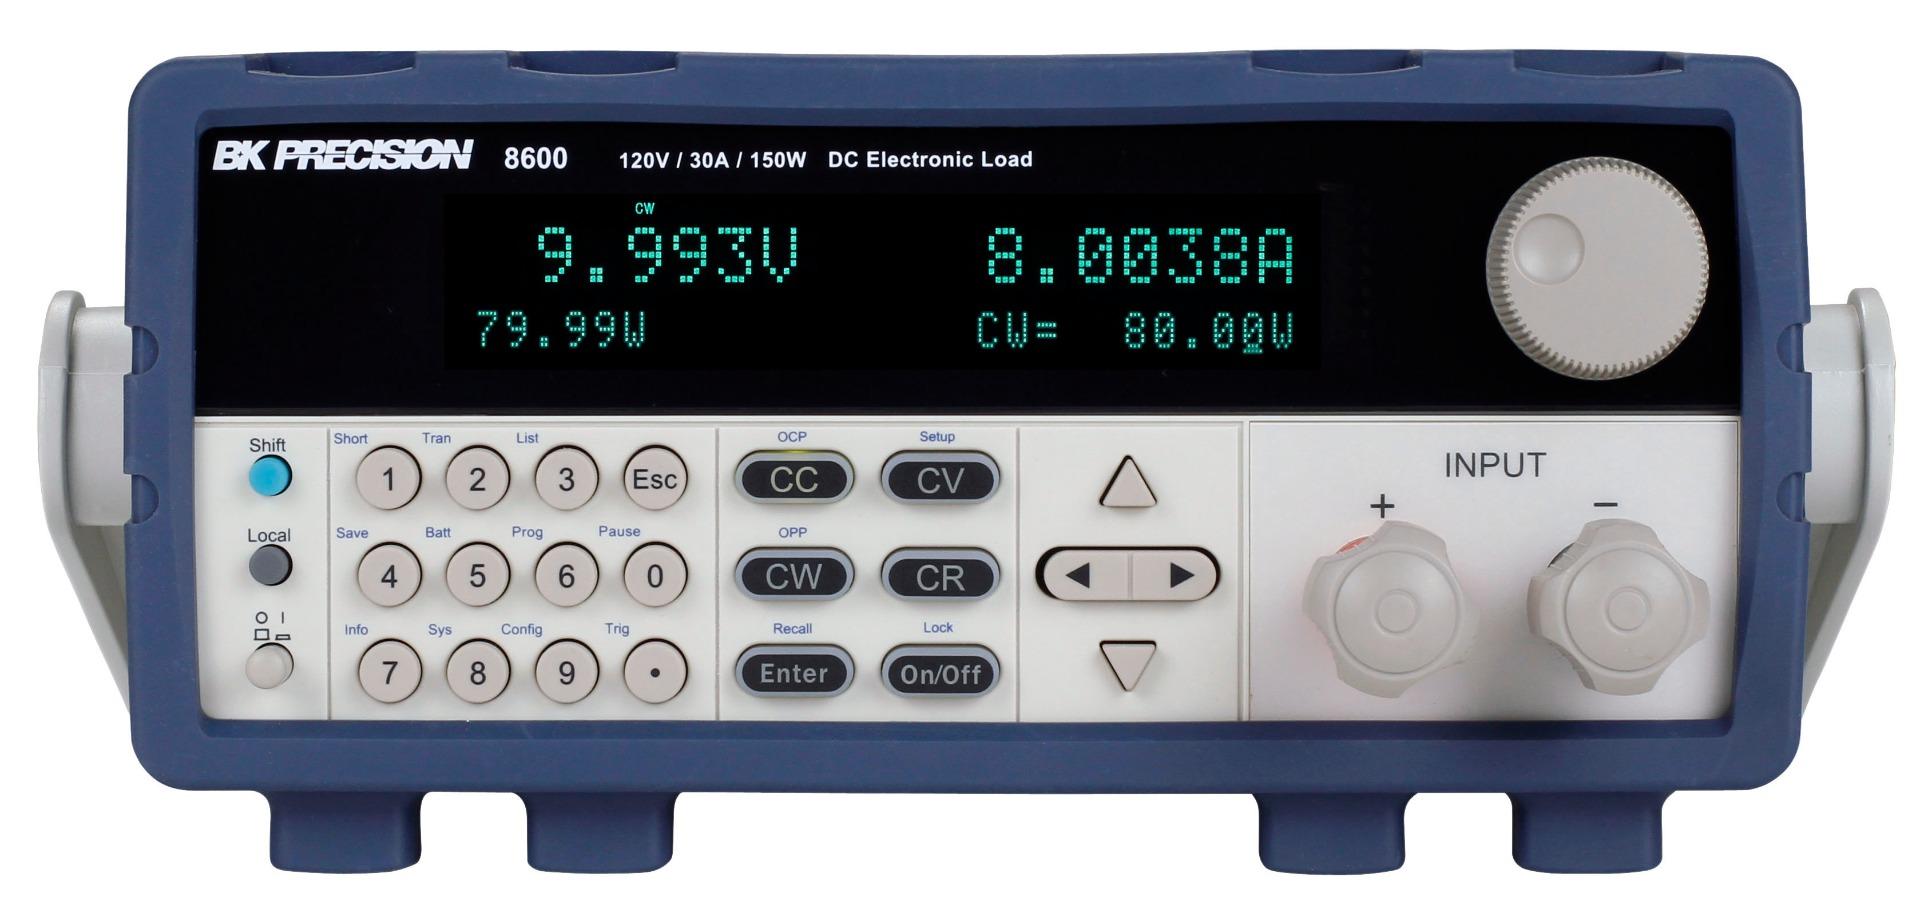 Image of BK-Precision-8625 by Valuetronics International Inc